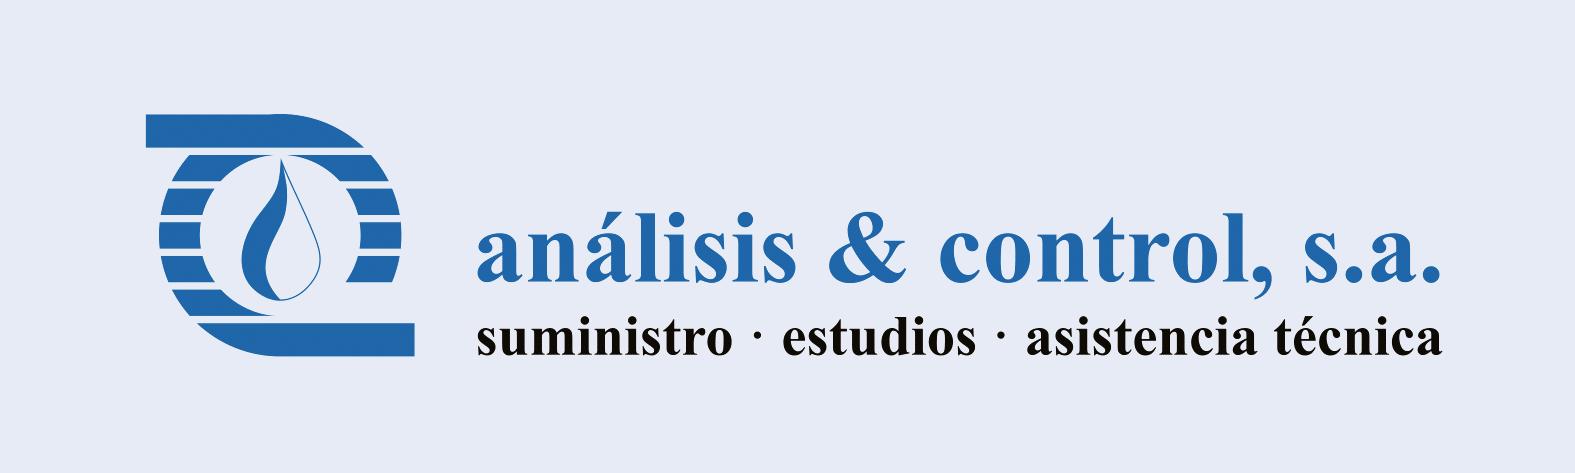 Análisis & Control S.A.